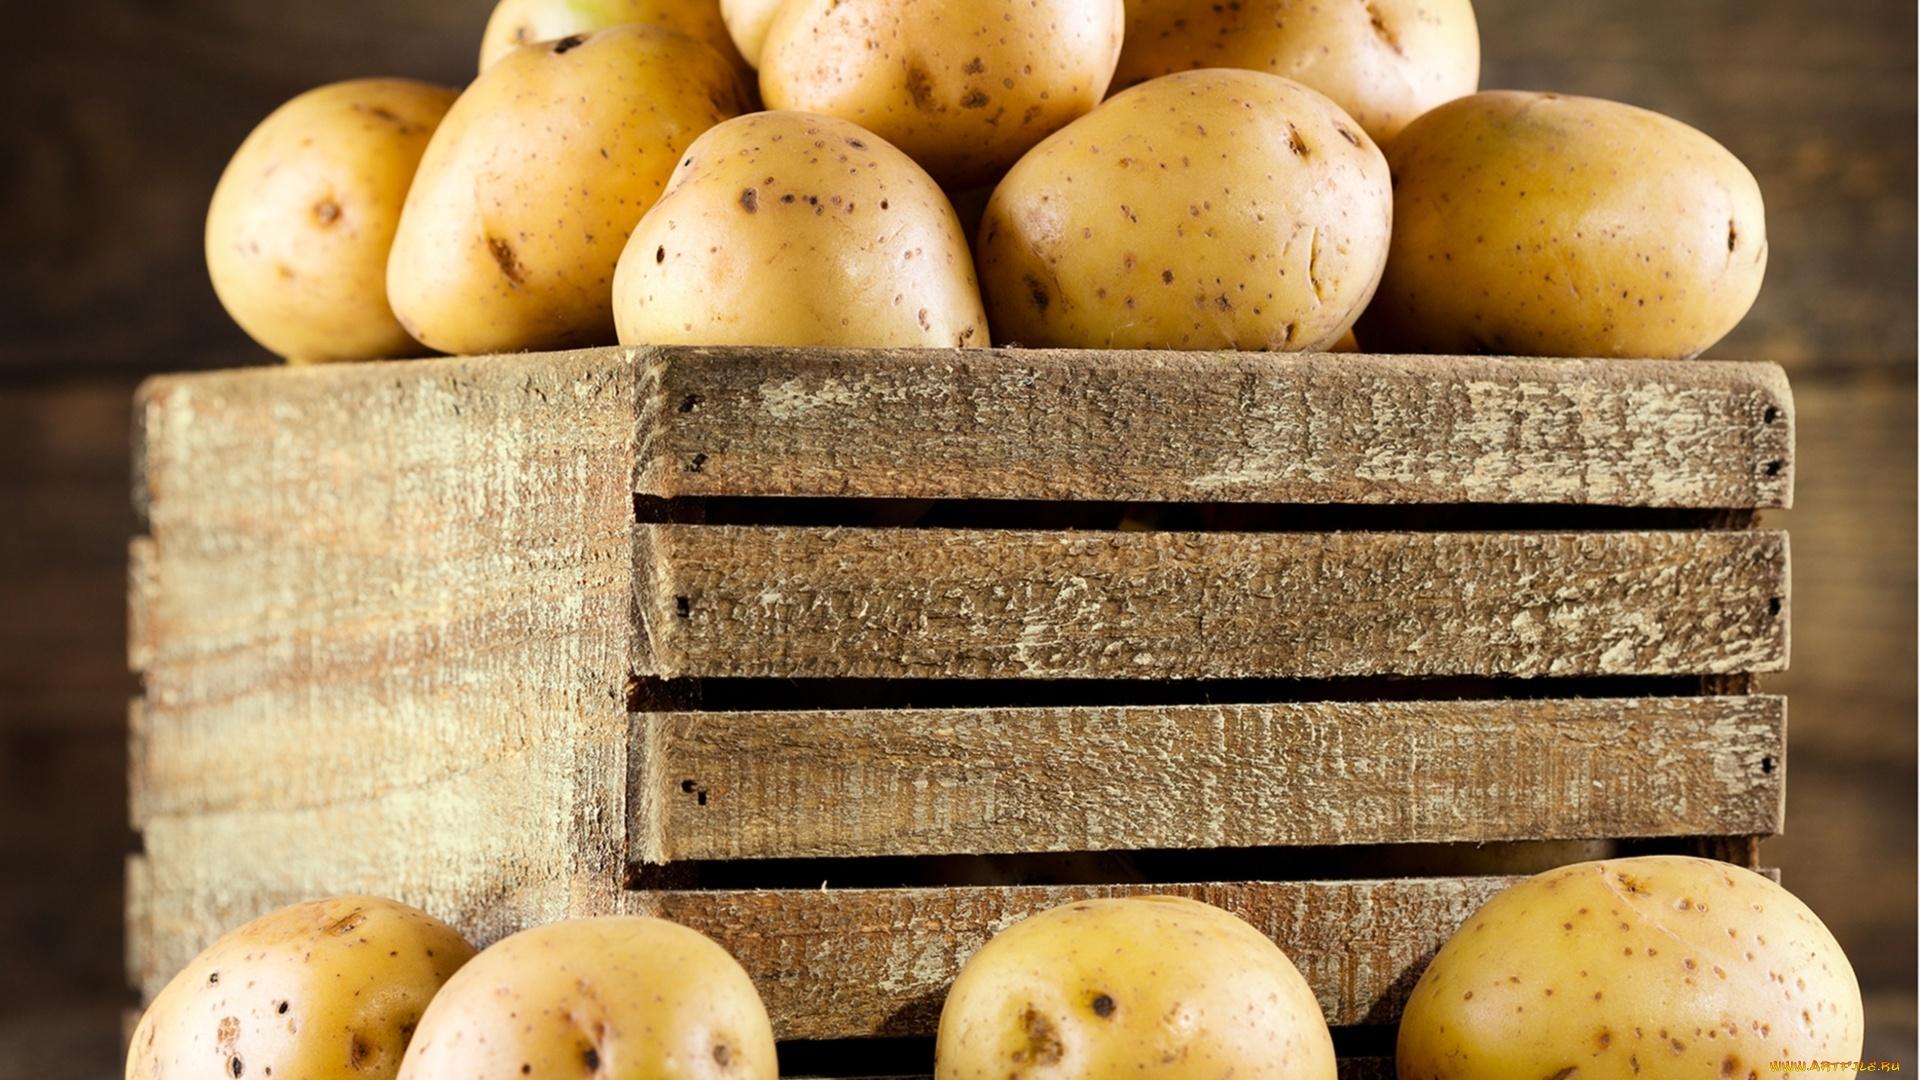 Potatoes Wallpaper for pc